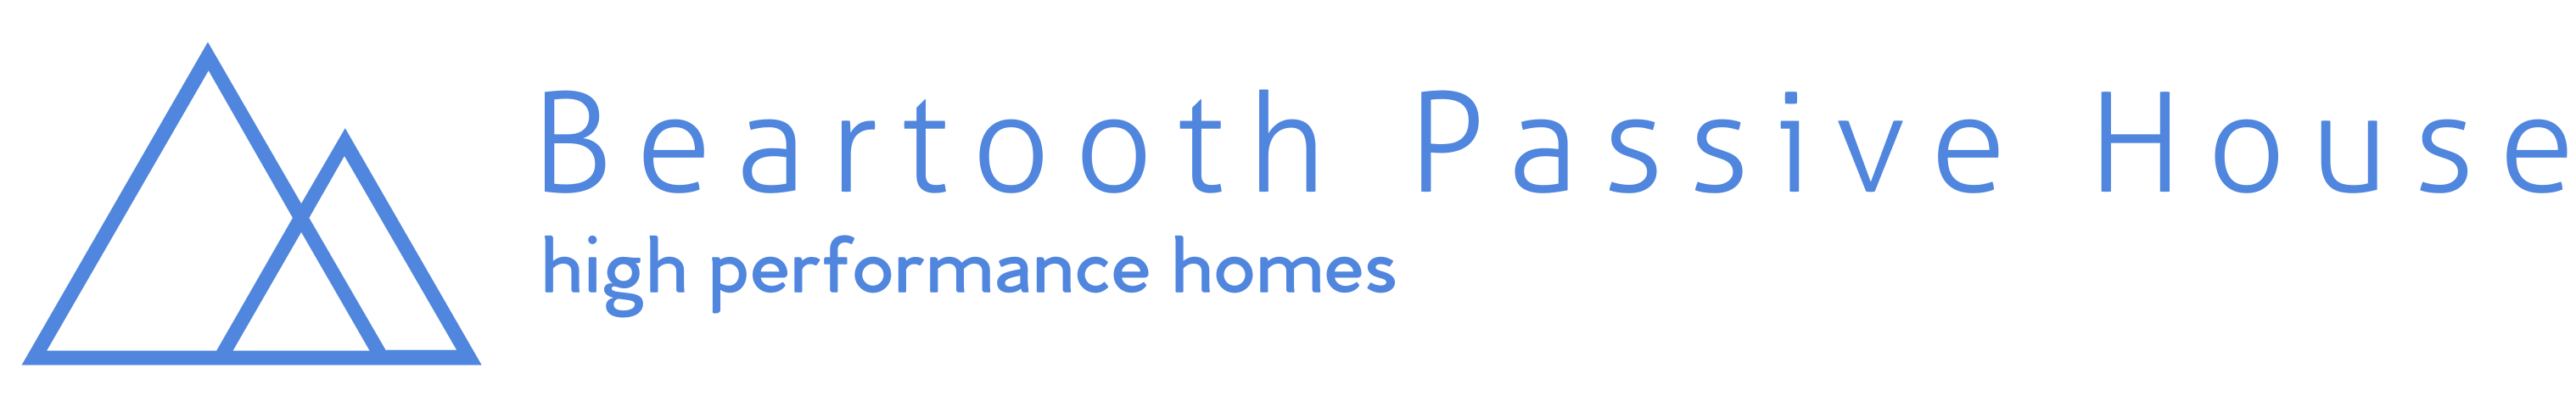 Beartooth Passive House